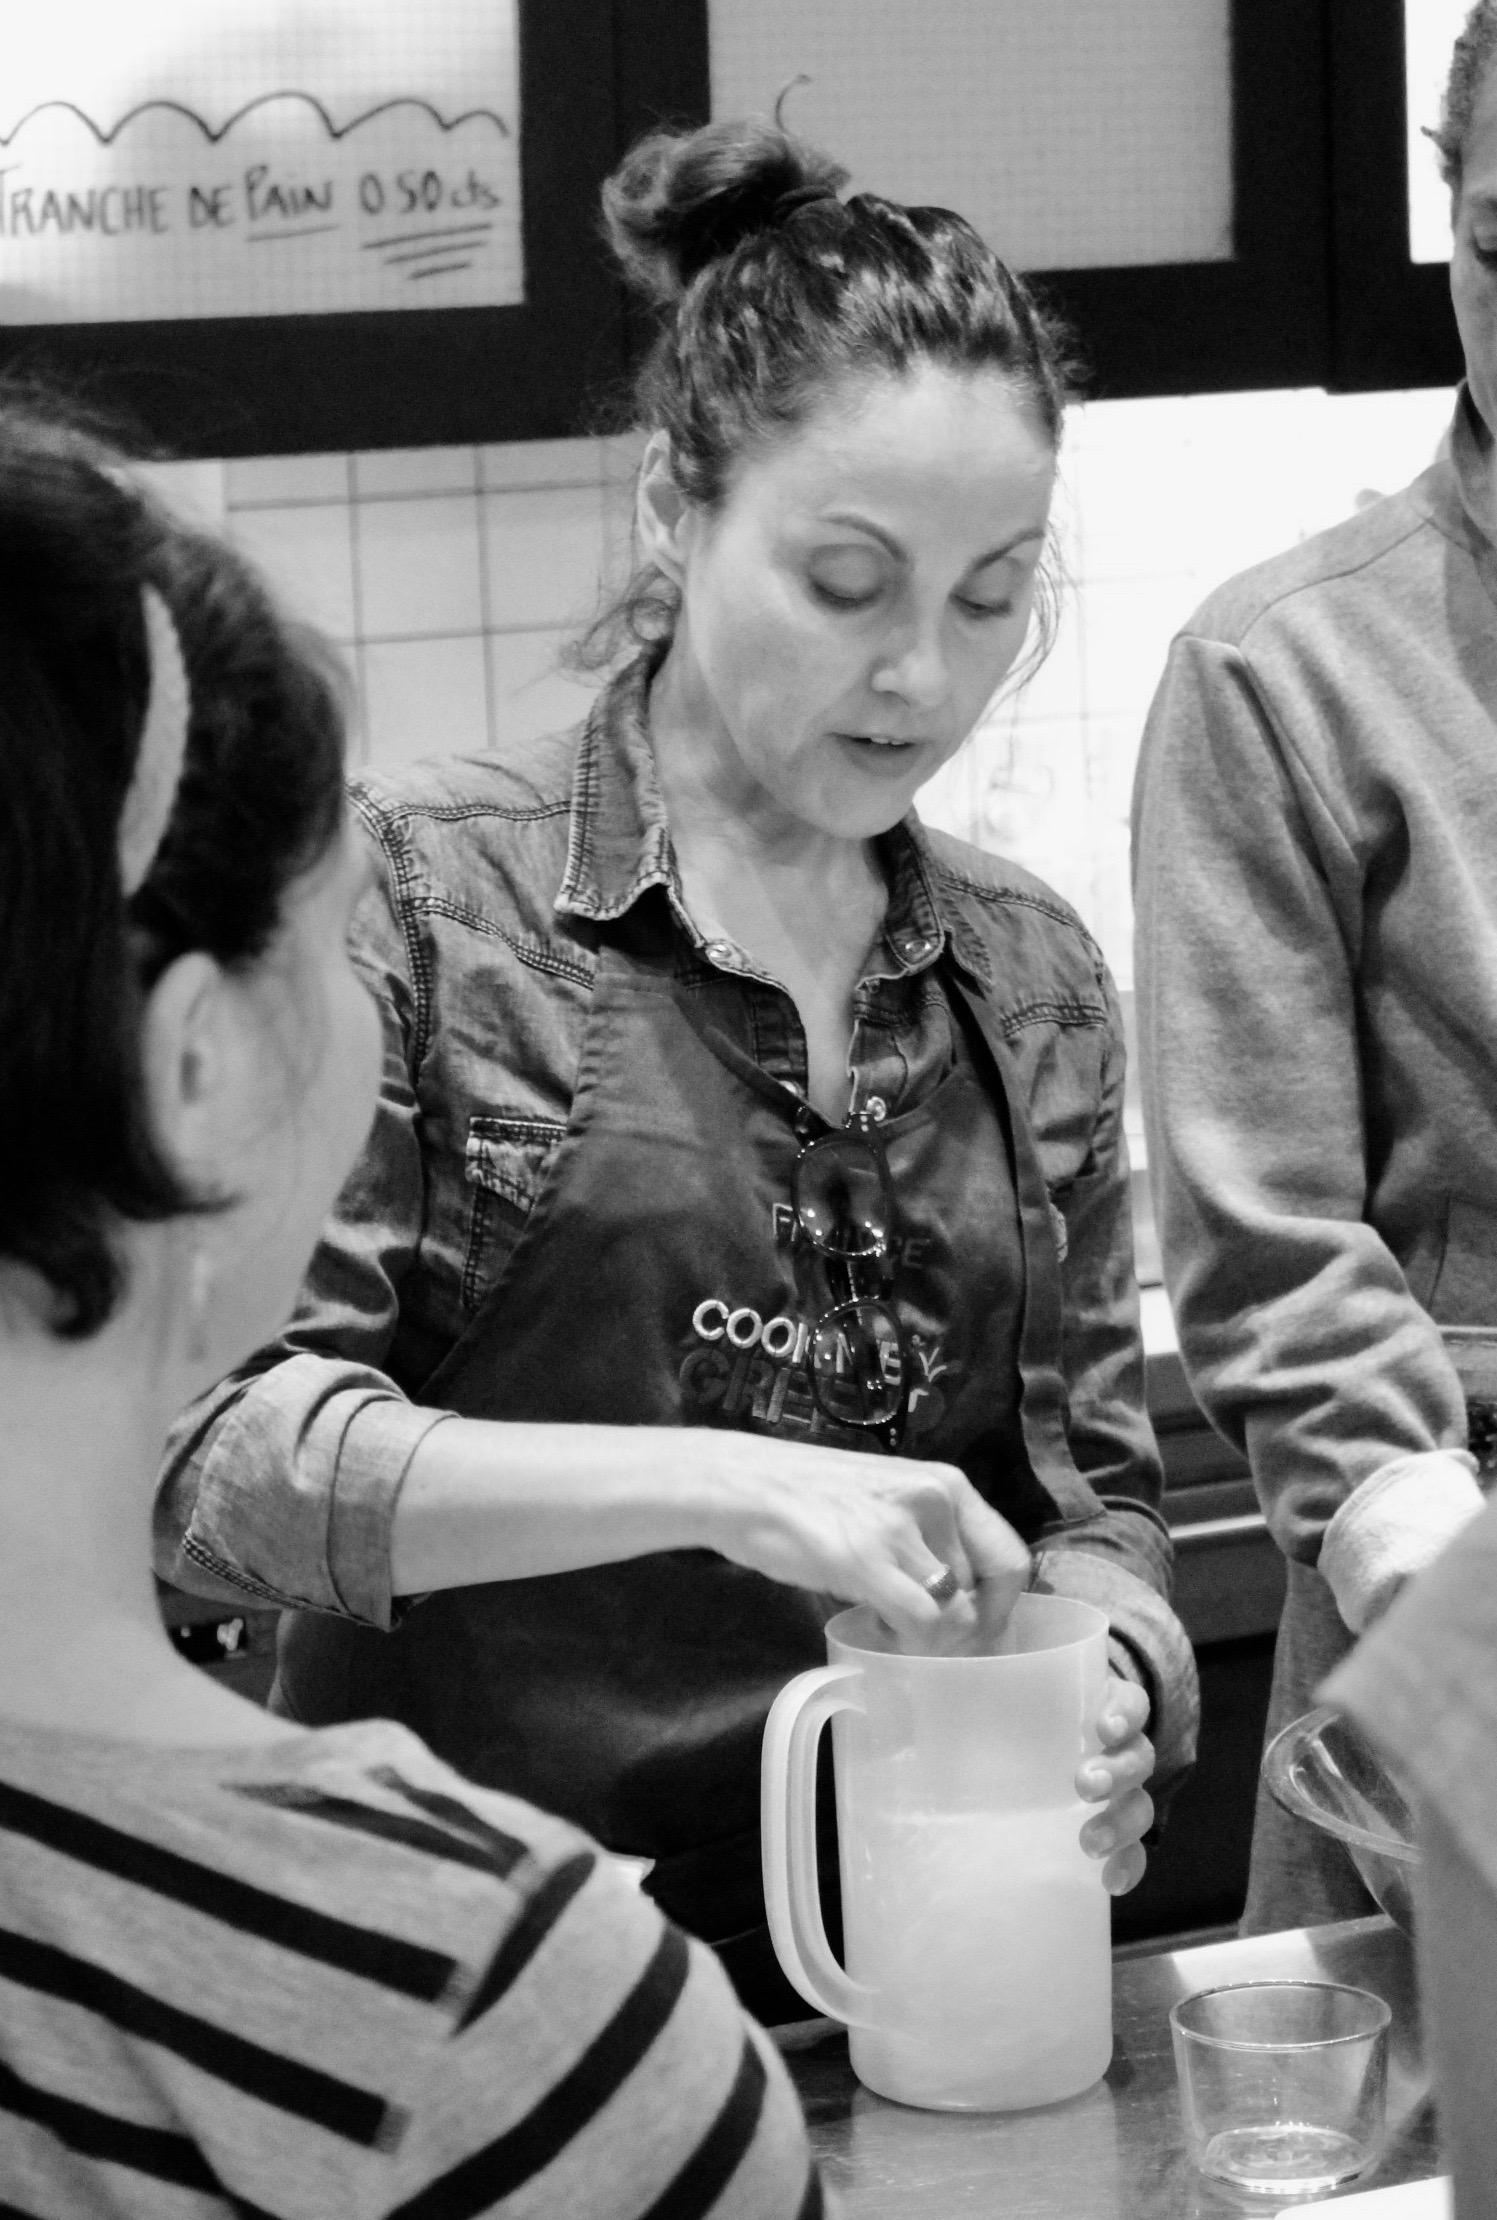 france-franco-cookmegreen-atelier-cuisine-ayurvedique-vegan-vegetarien.jpg